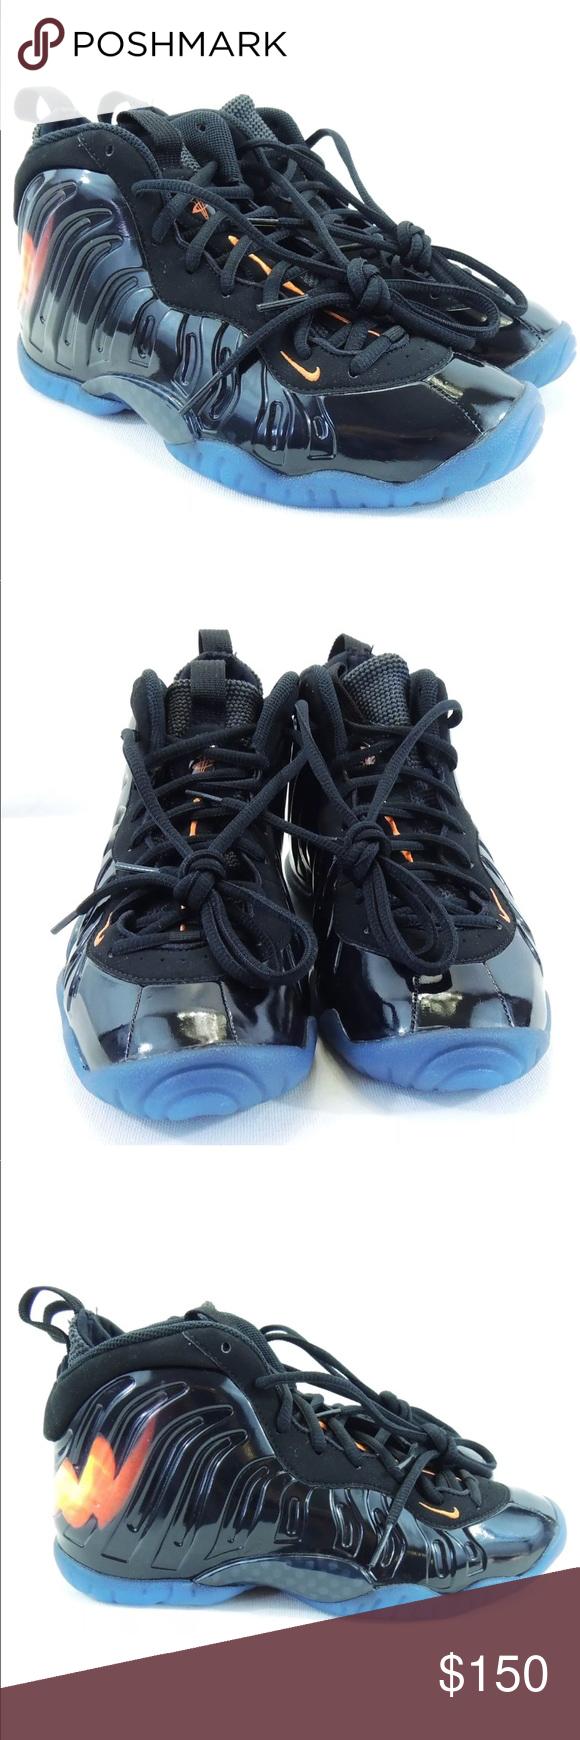 4858a2e590b NIKE Little Posite One QS (GS) HALLOWEEN GLOW BRAND  Nike MODEL  NIKE